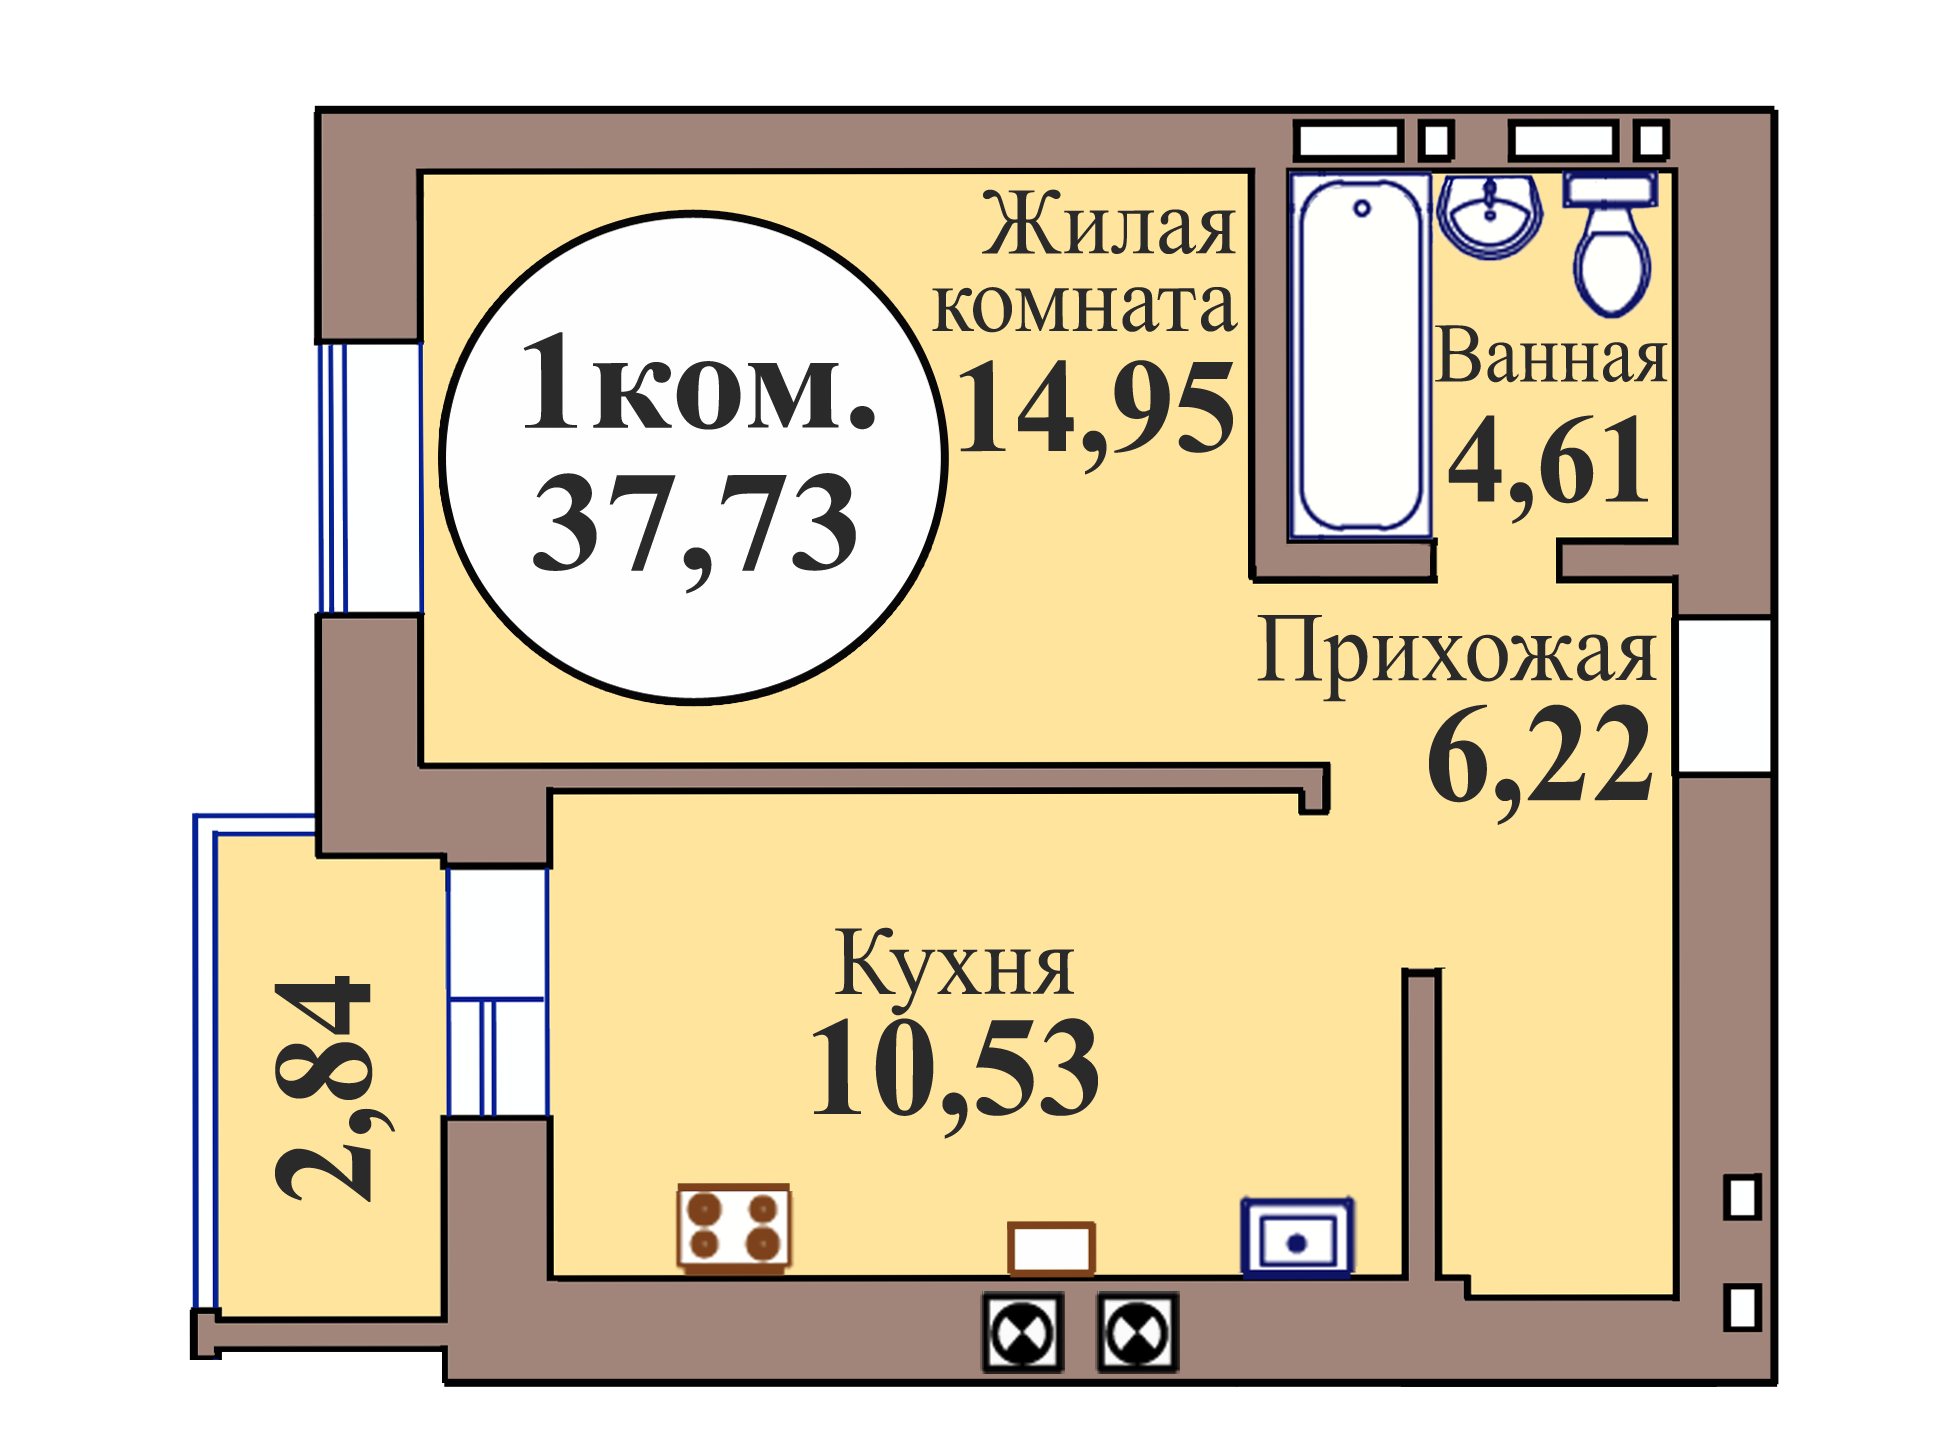 1-комн. кв. по пер. Калининградский, 5 кв. 220 в Калининграде